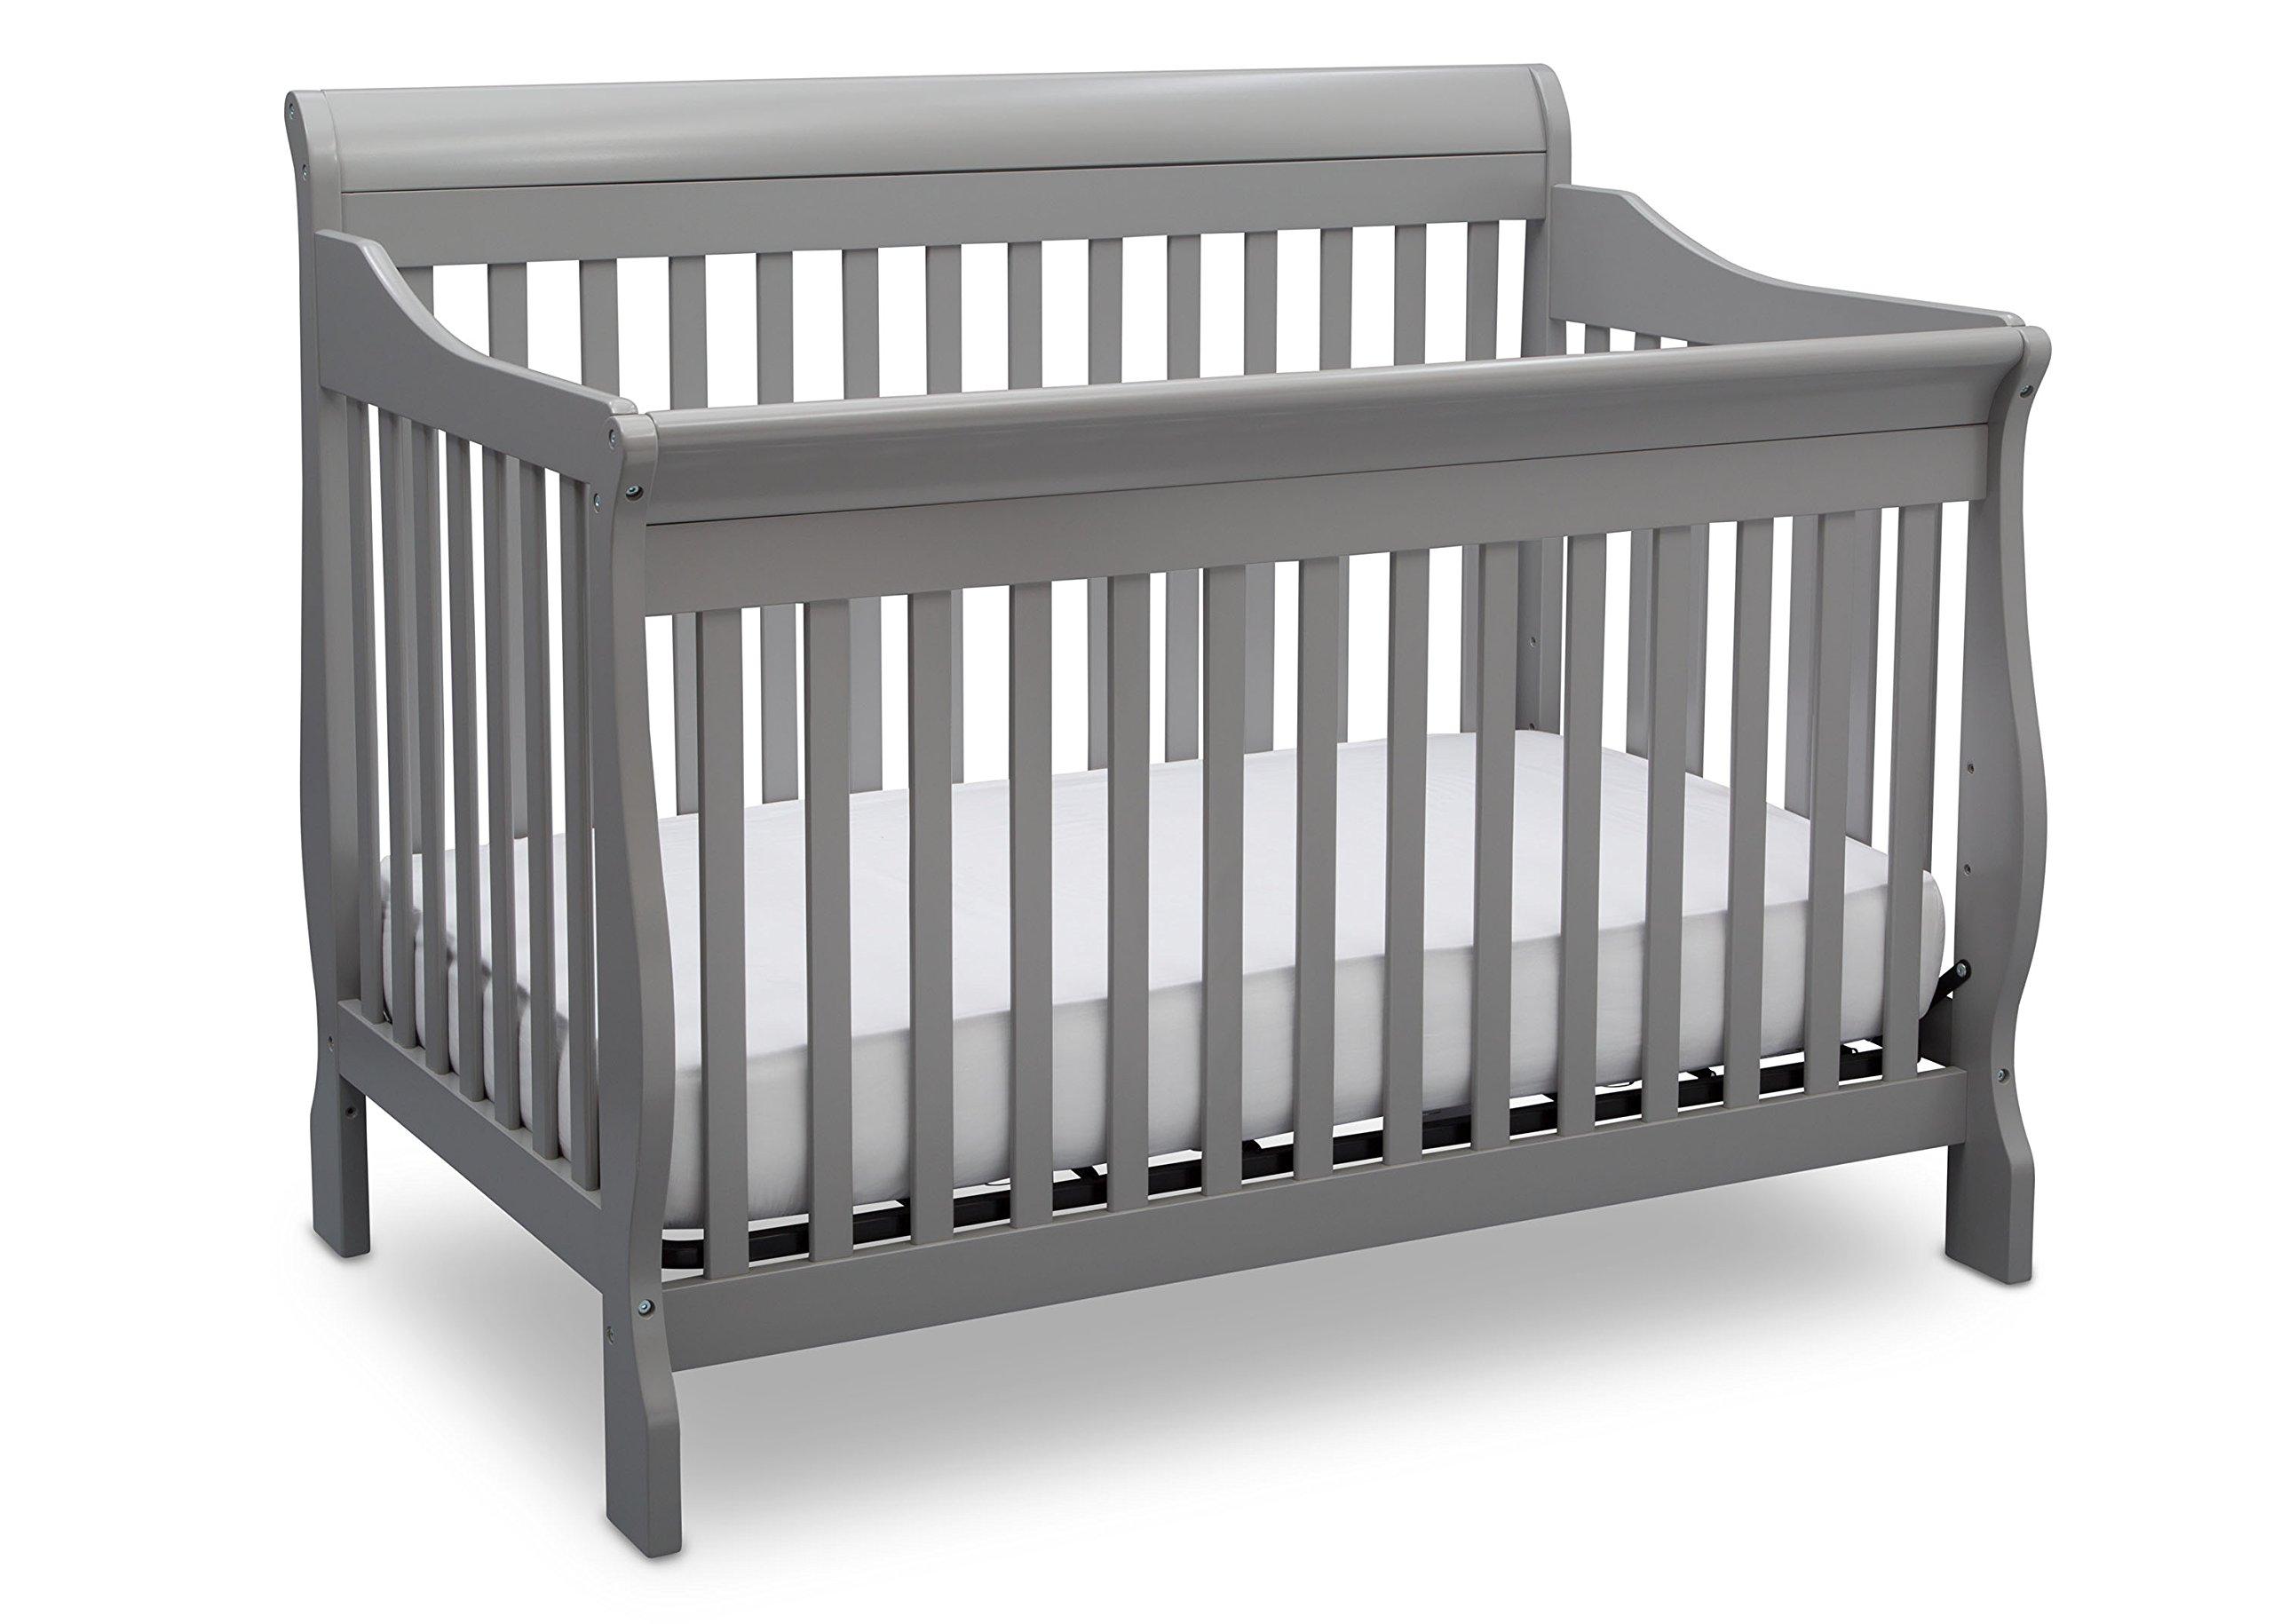 29d6447cd Amazon.com   Delta Children Canton 4-in-1 Convertible Baby Crib ...